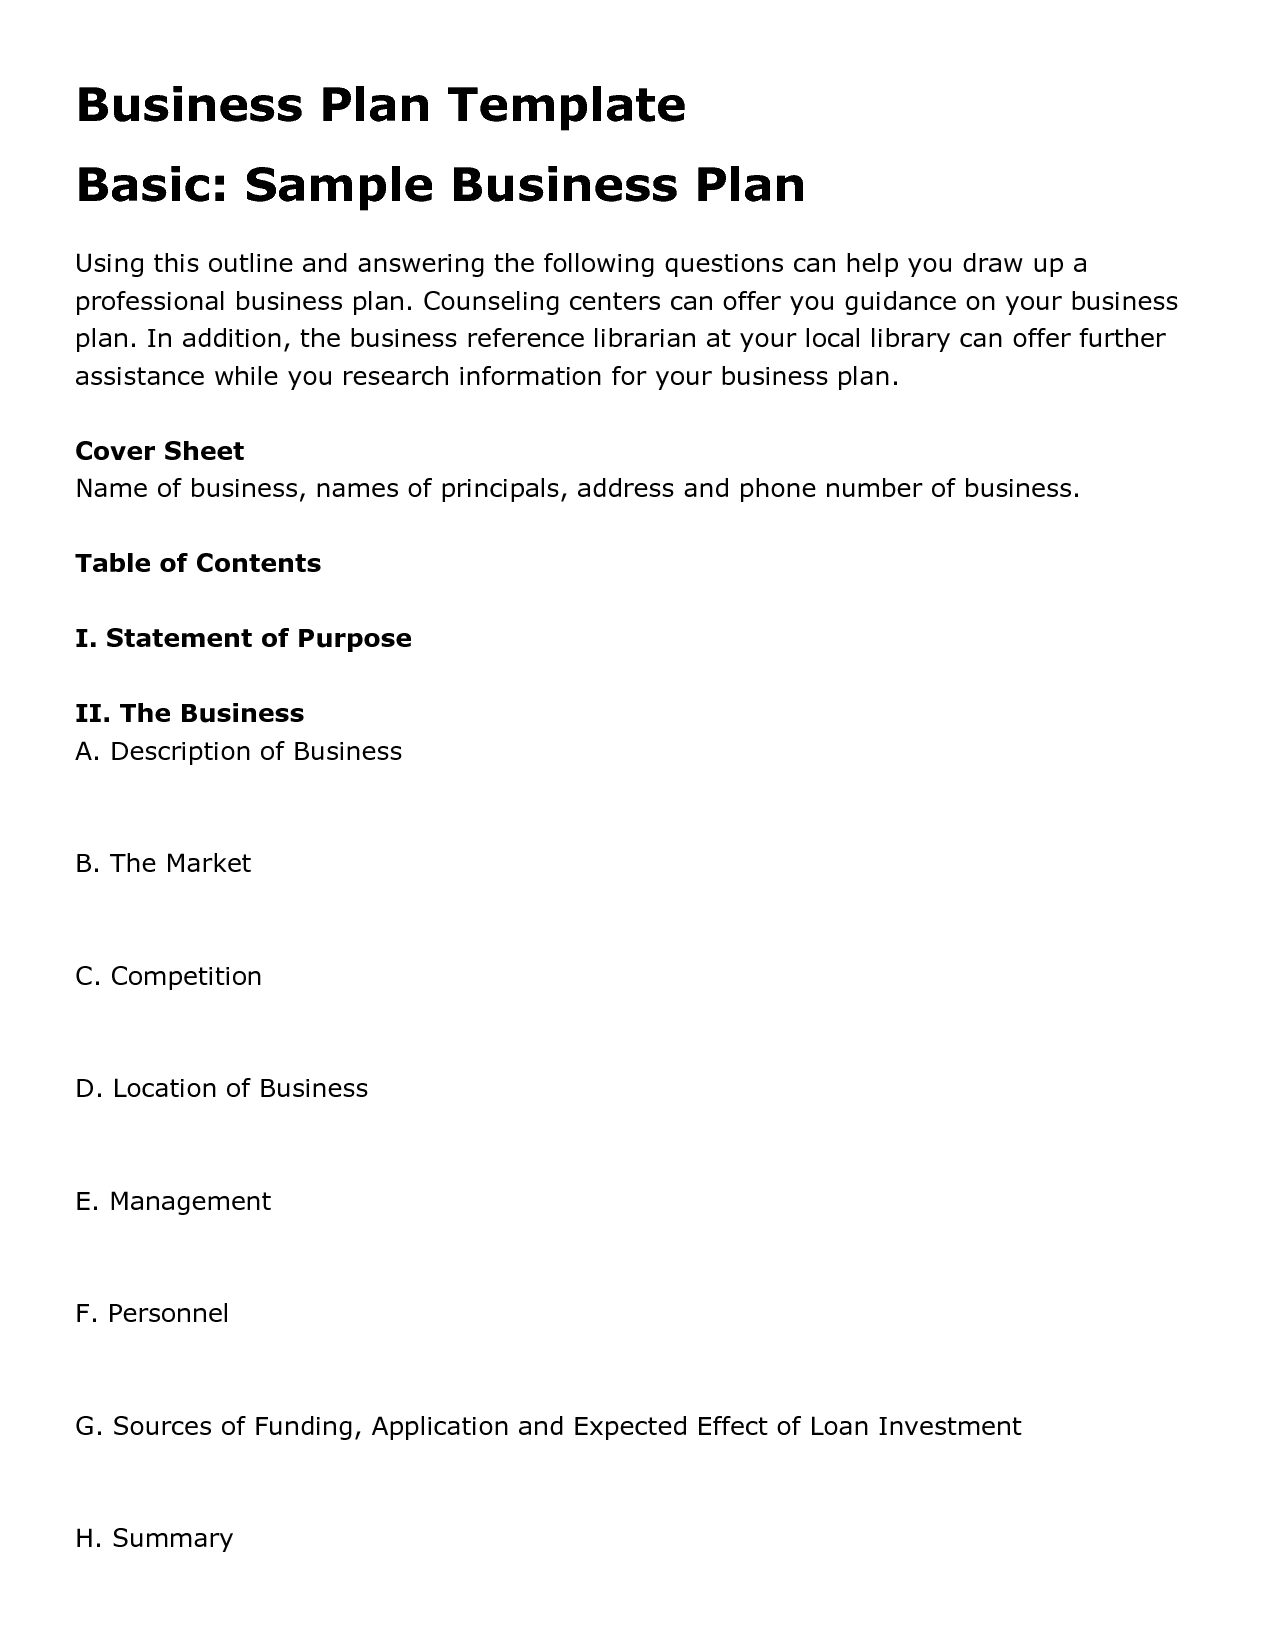 Printable Sample Business Plan Template Form | Entrepreneur Inspo - Free Printable Simple Business Plan Template